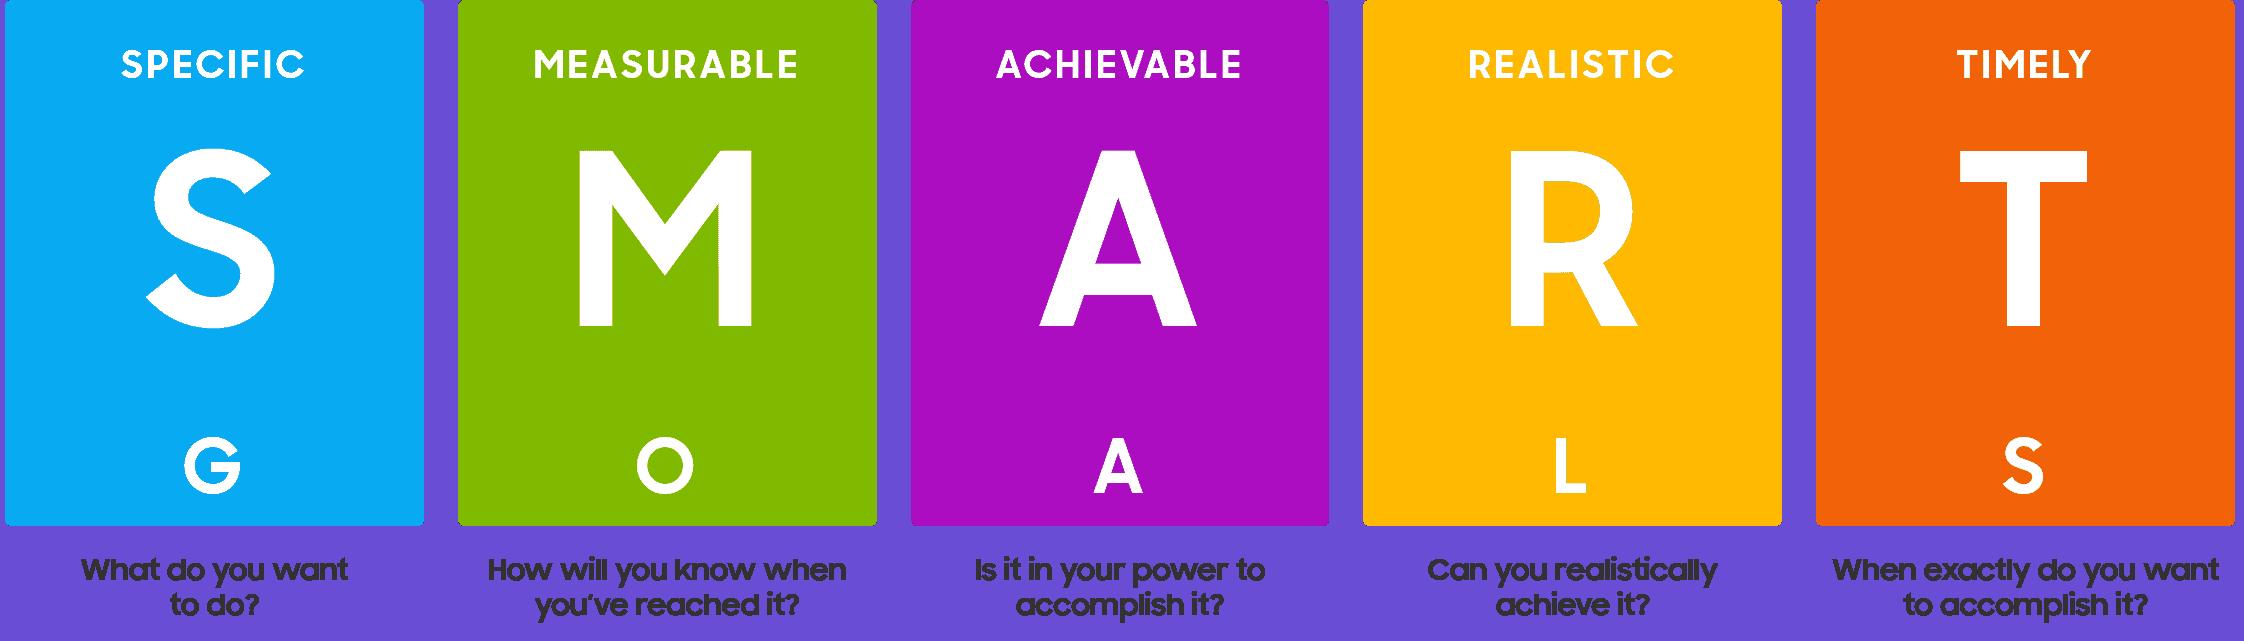 Smart - Making Goals Measurable